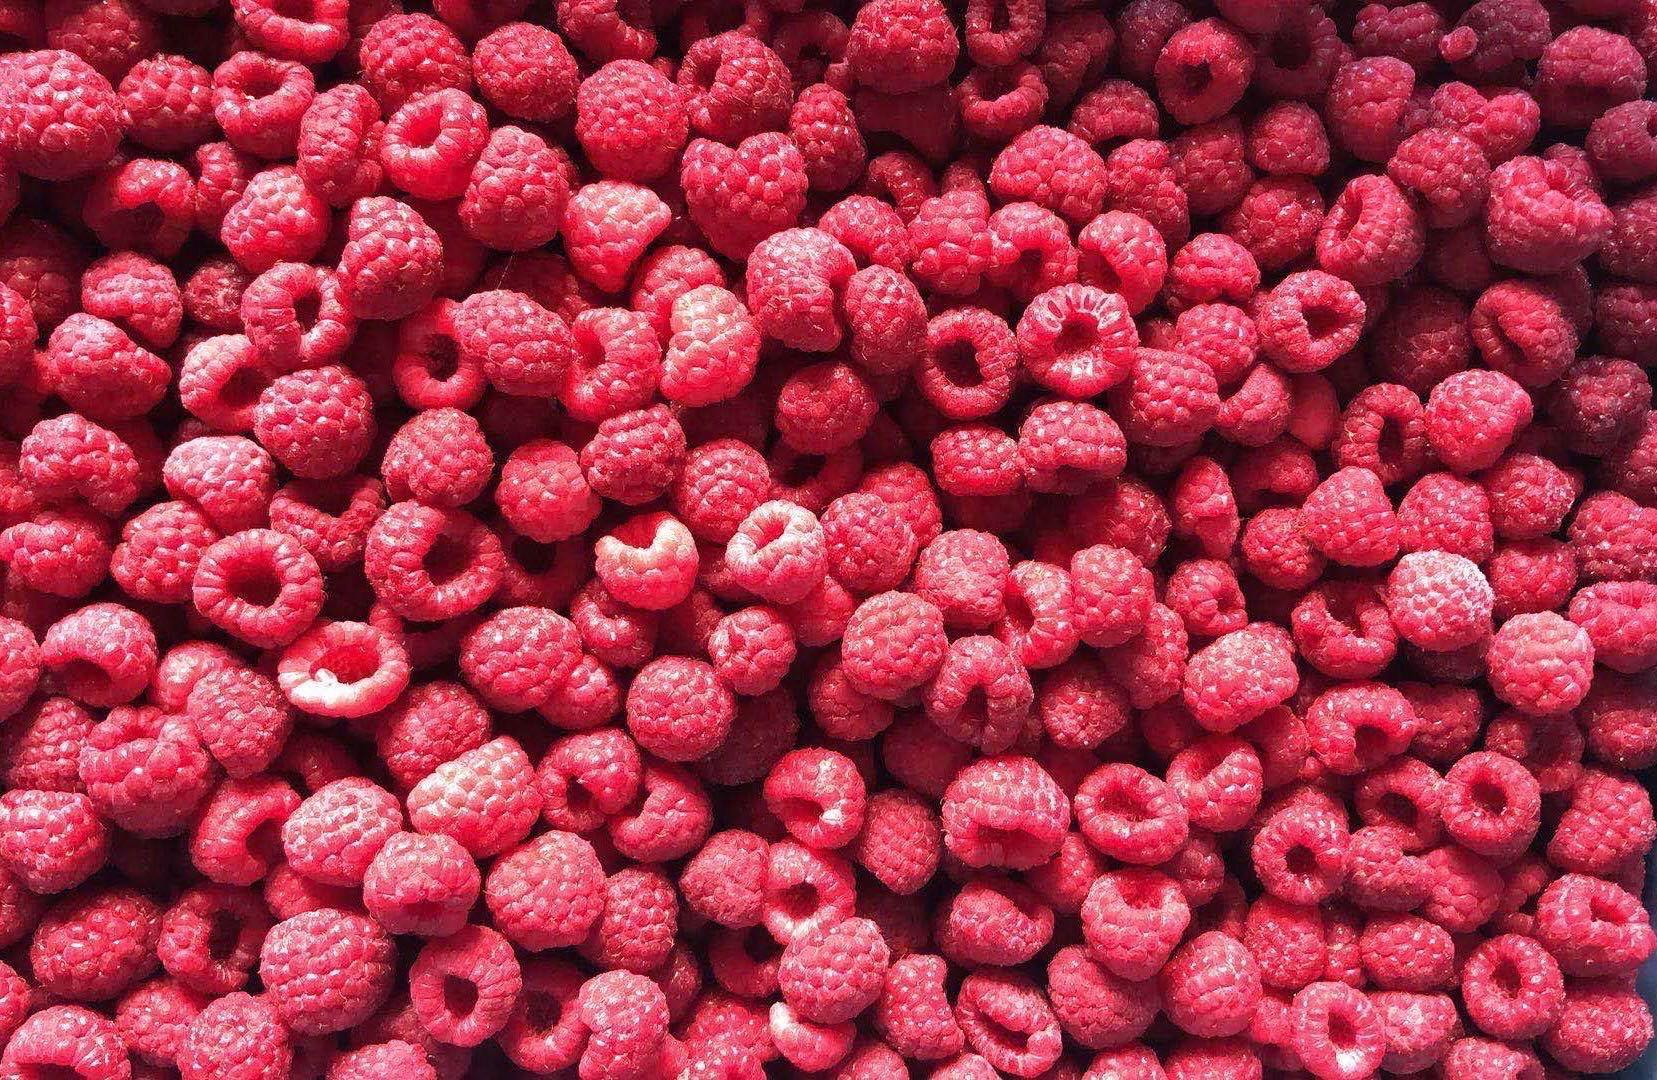 IQF Raspberries,Frozen Raspberry,wholes/brokens/crumbles/puree 4